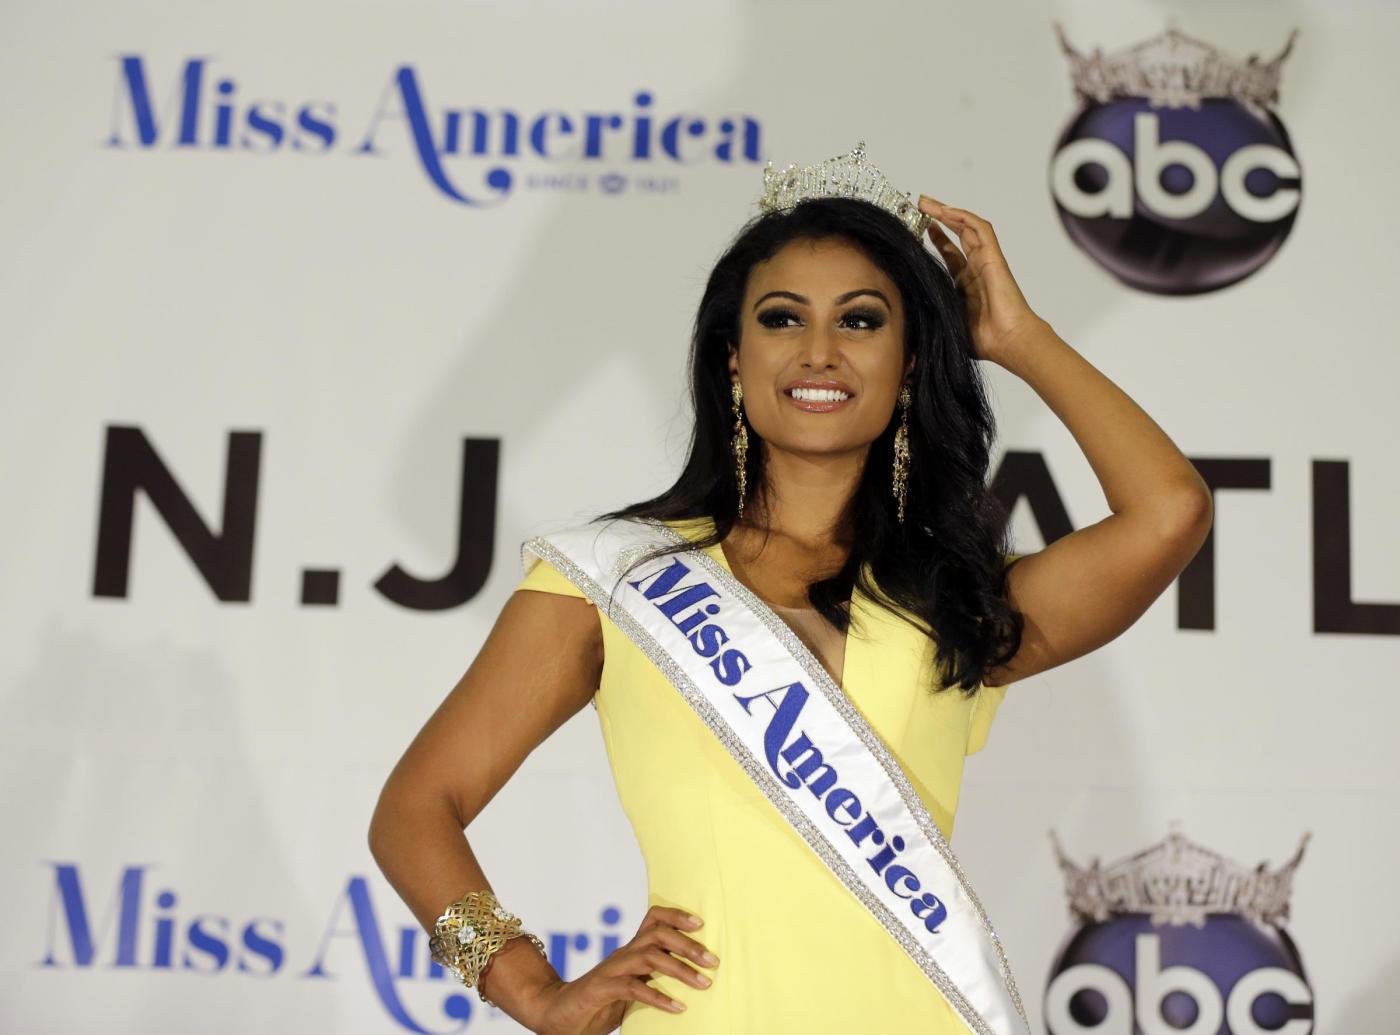 Nina Davuluri, Miss America ha origini indiane: è la prima volta07